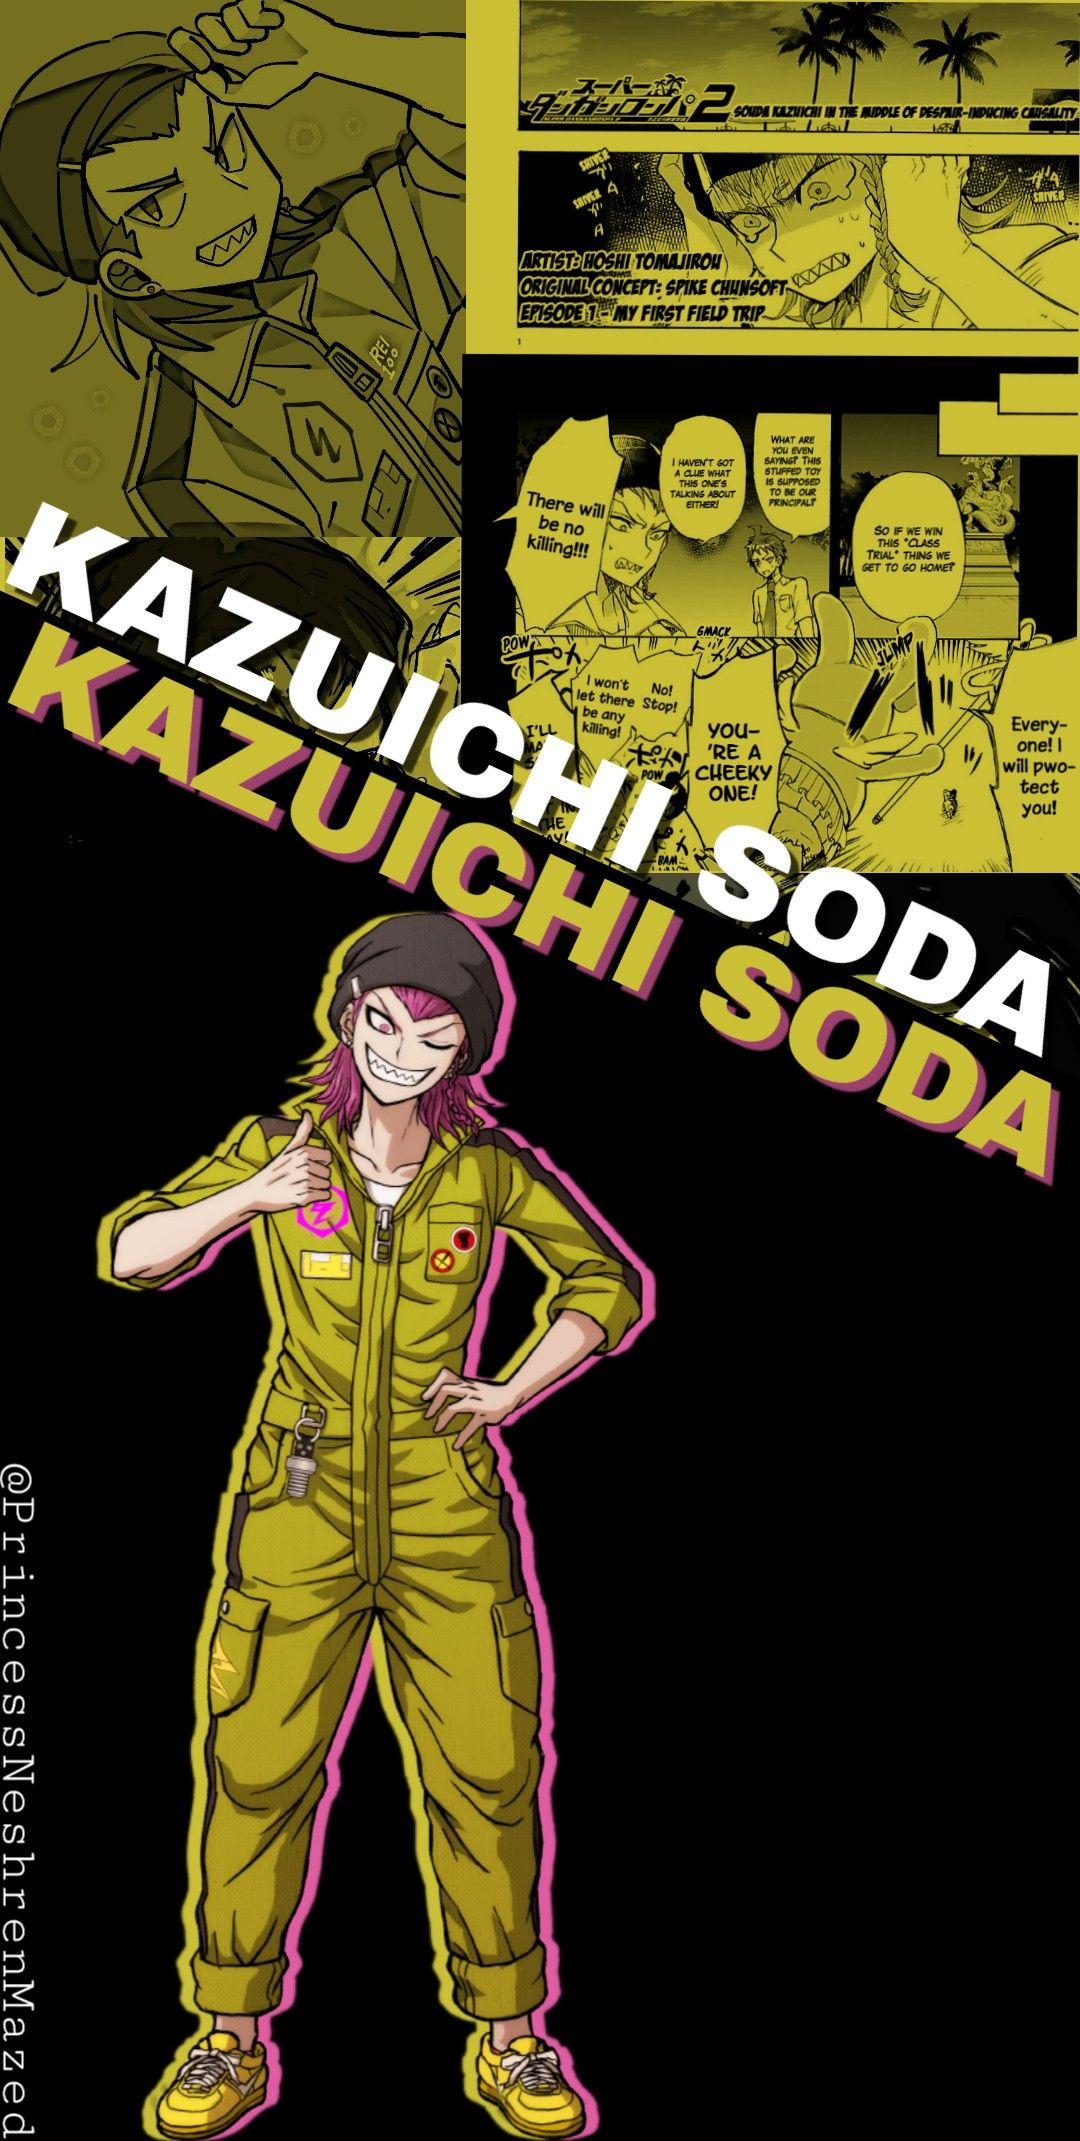 Kazuichi Soda Wallpaper Anime Wallpaper Cute Anime Wallpaper Danganronpa